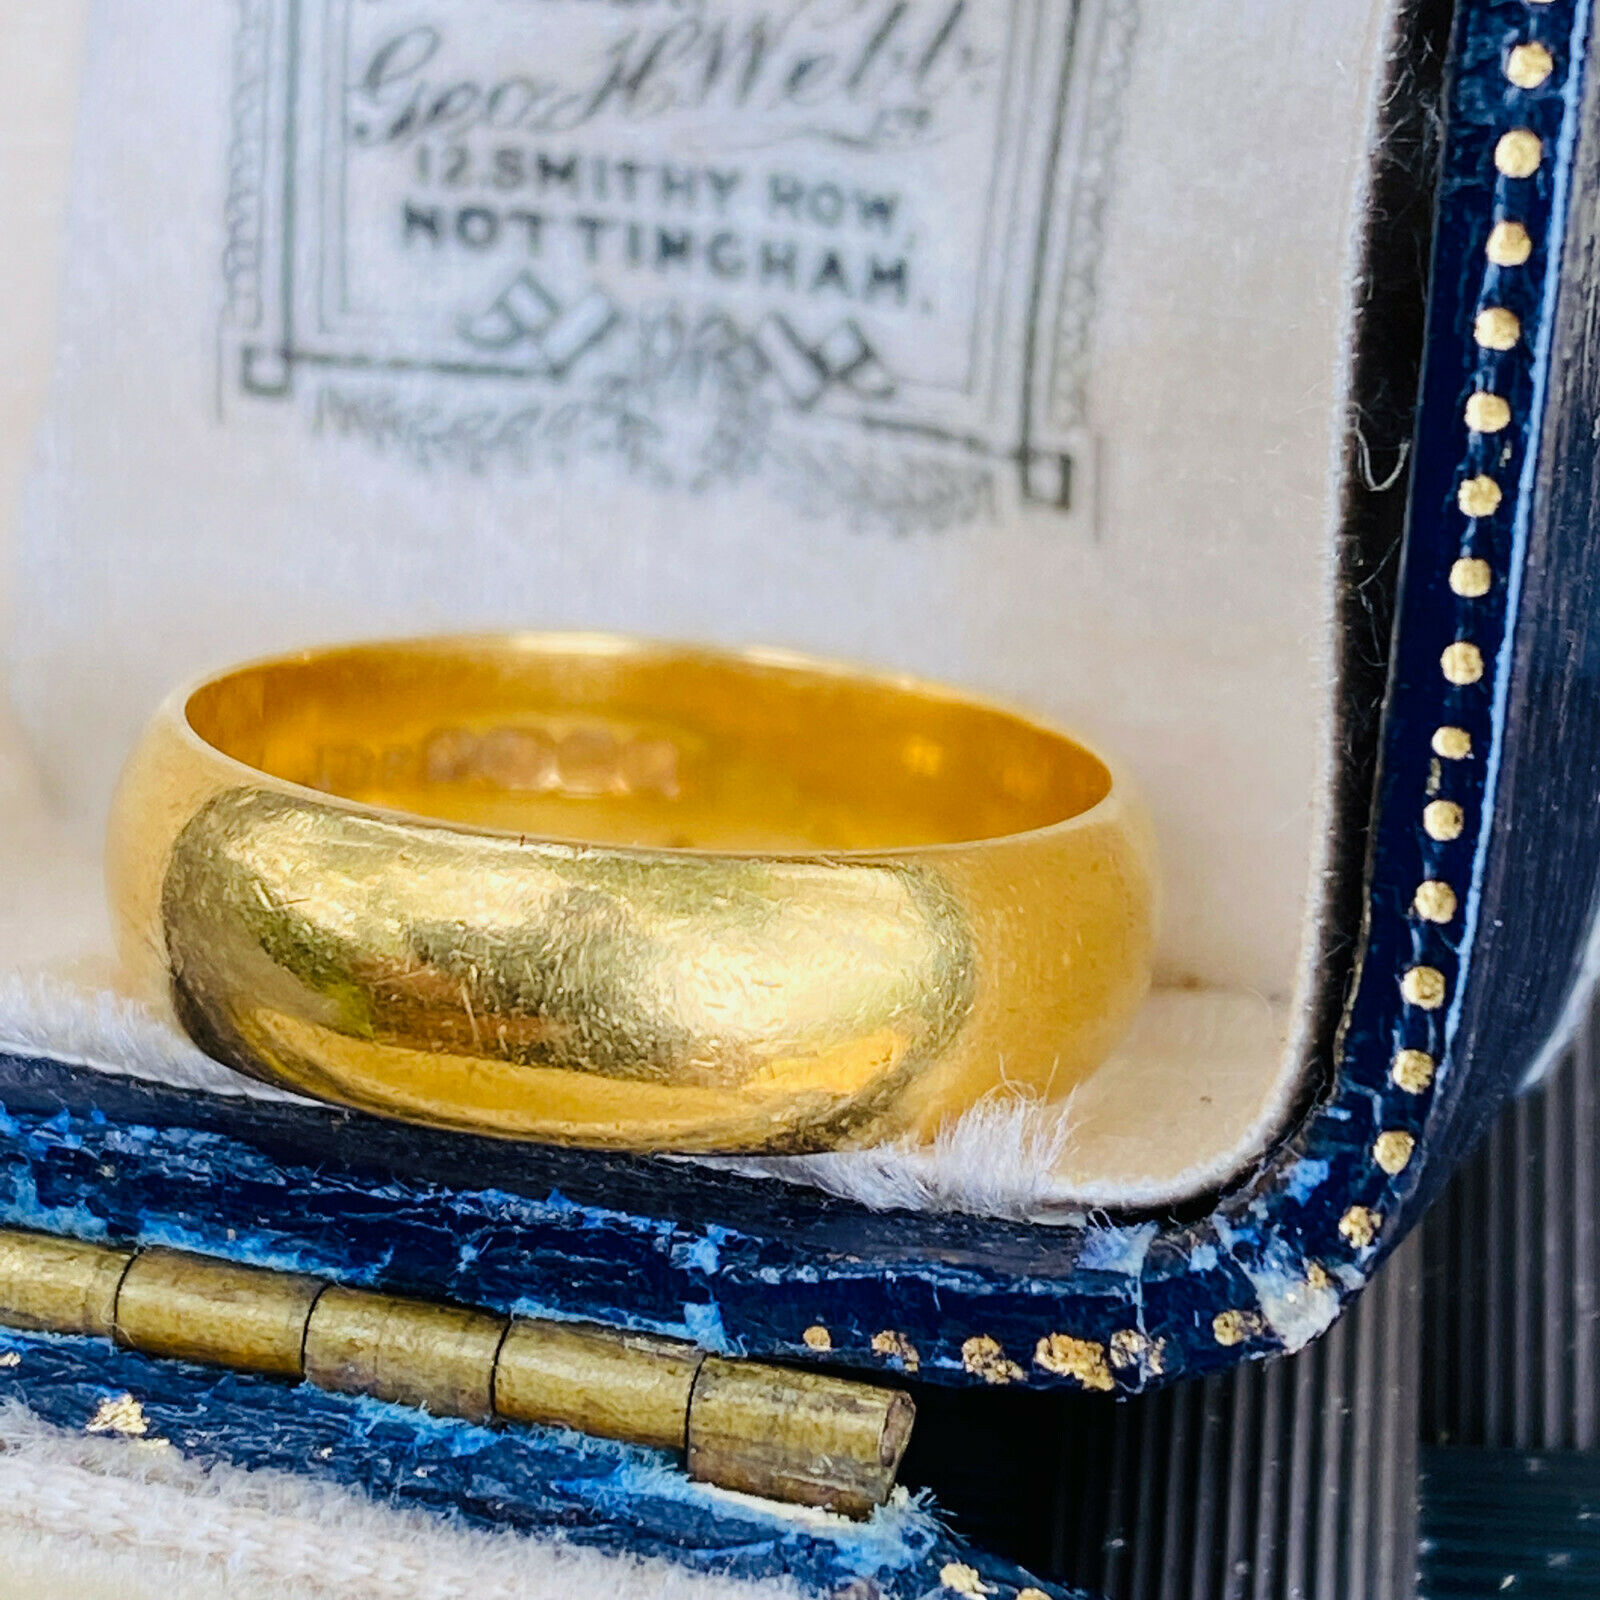 Vintage 22ct, 22k, 980 solid yellow gold D-shaped wedding ring, Birmingham 1994